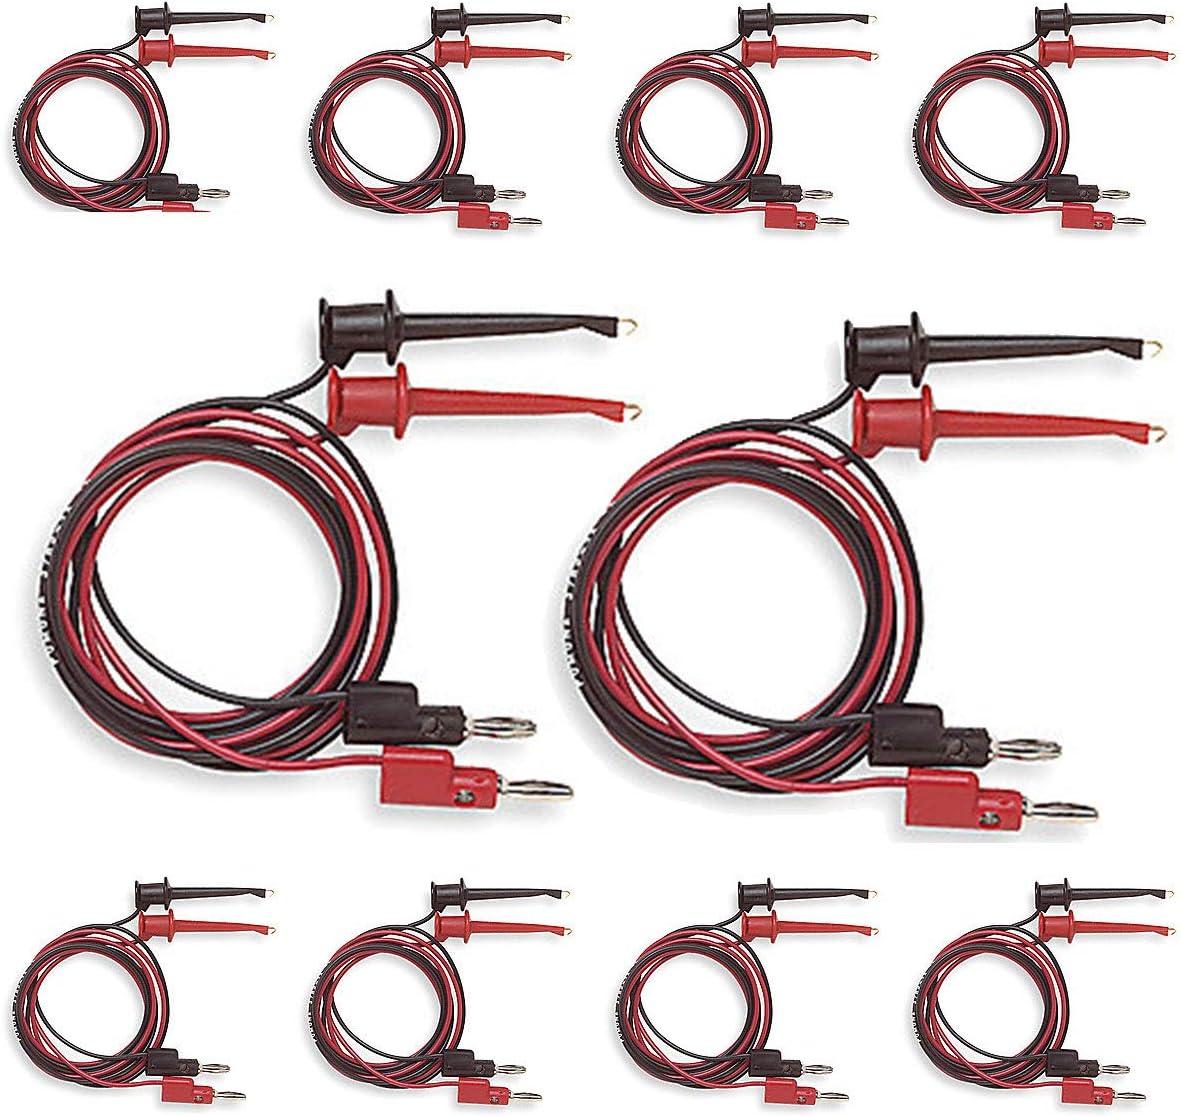 IC Hook to IC Hook Test Lead Set